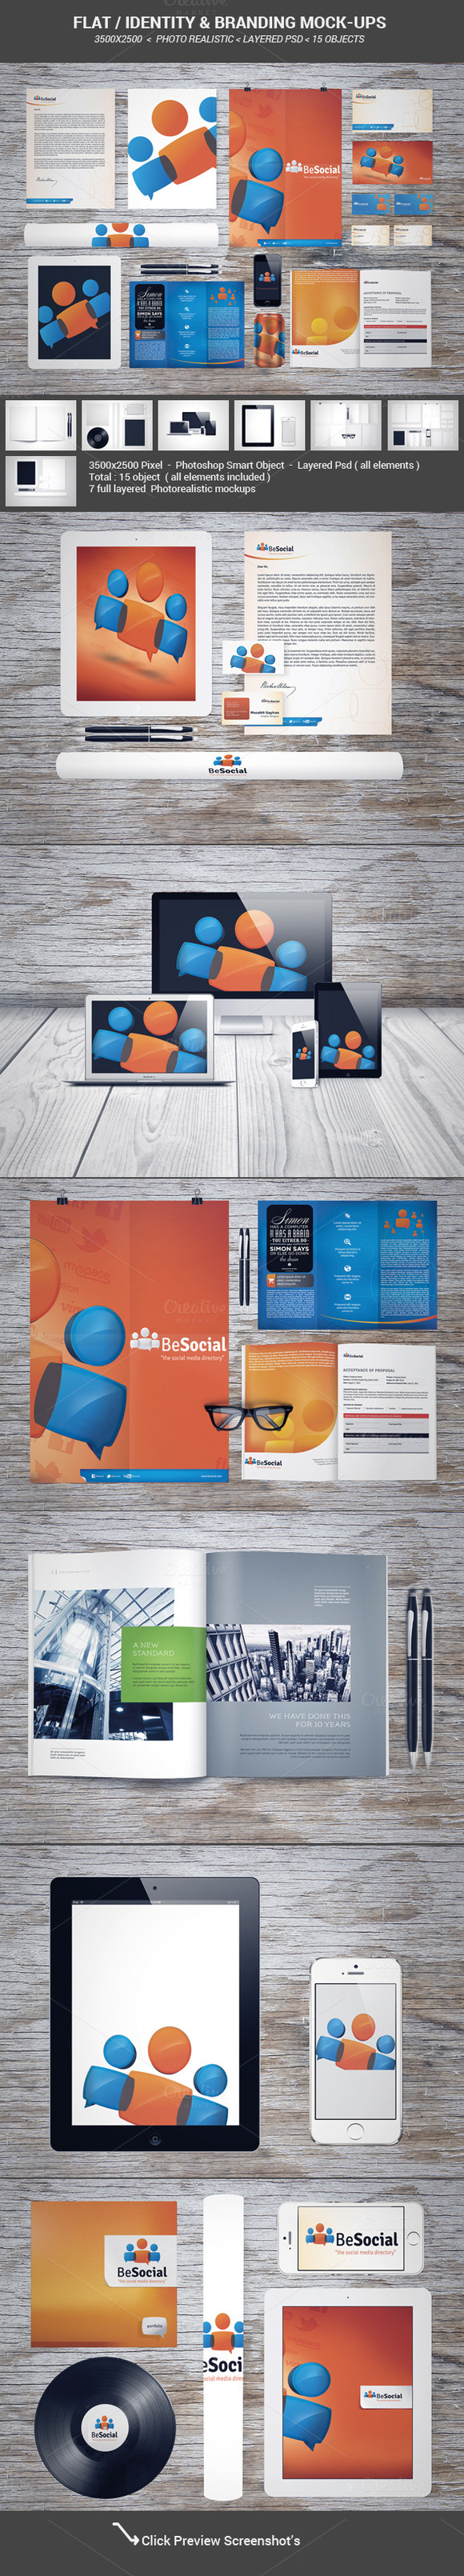 Flat identity & Branding mock-ups - Product Mockups - 1